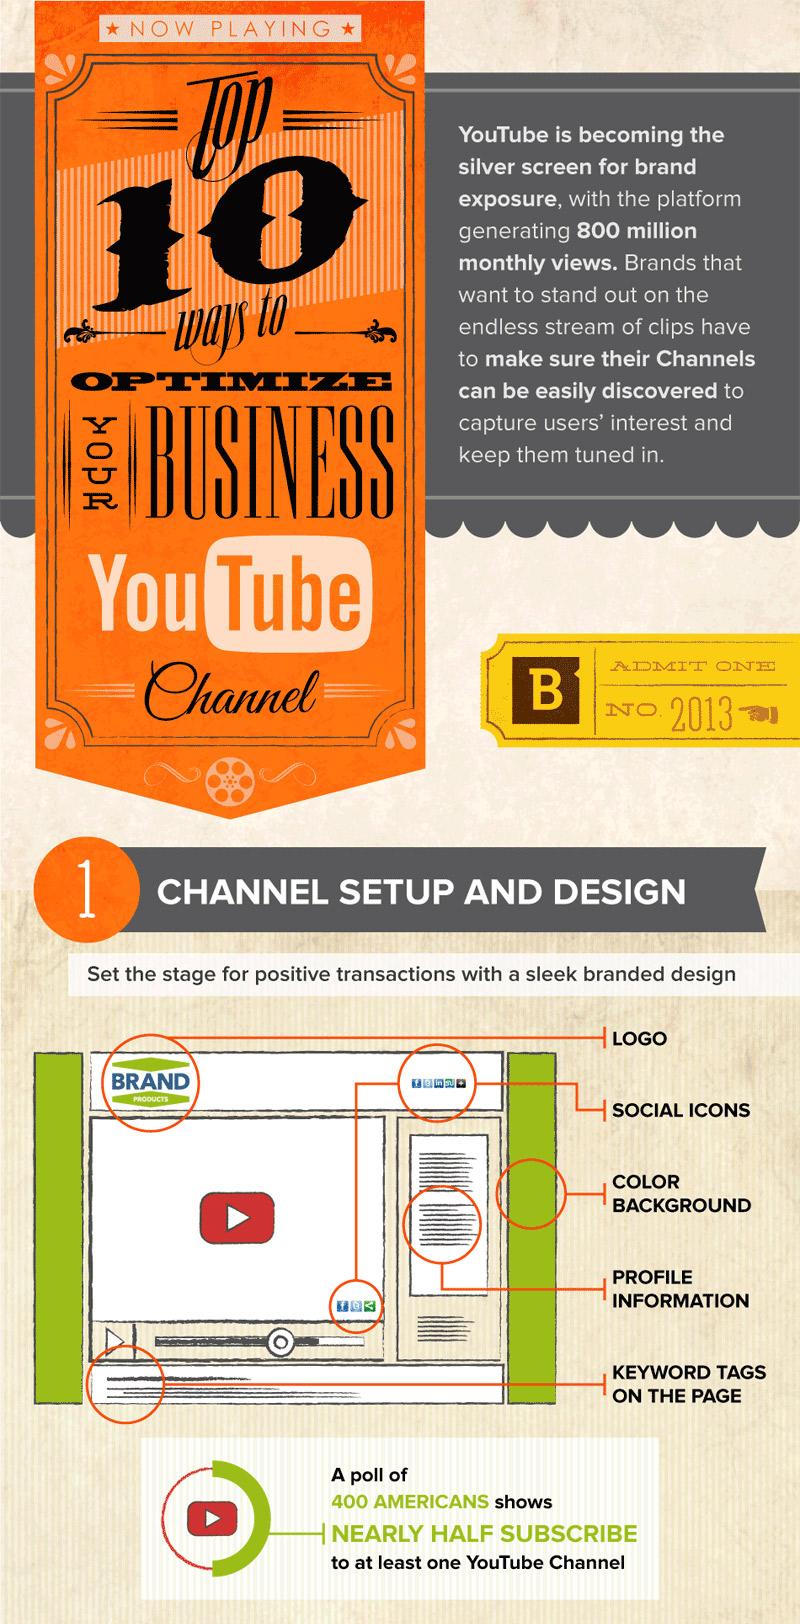 youtube-marketing-tips-1